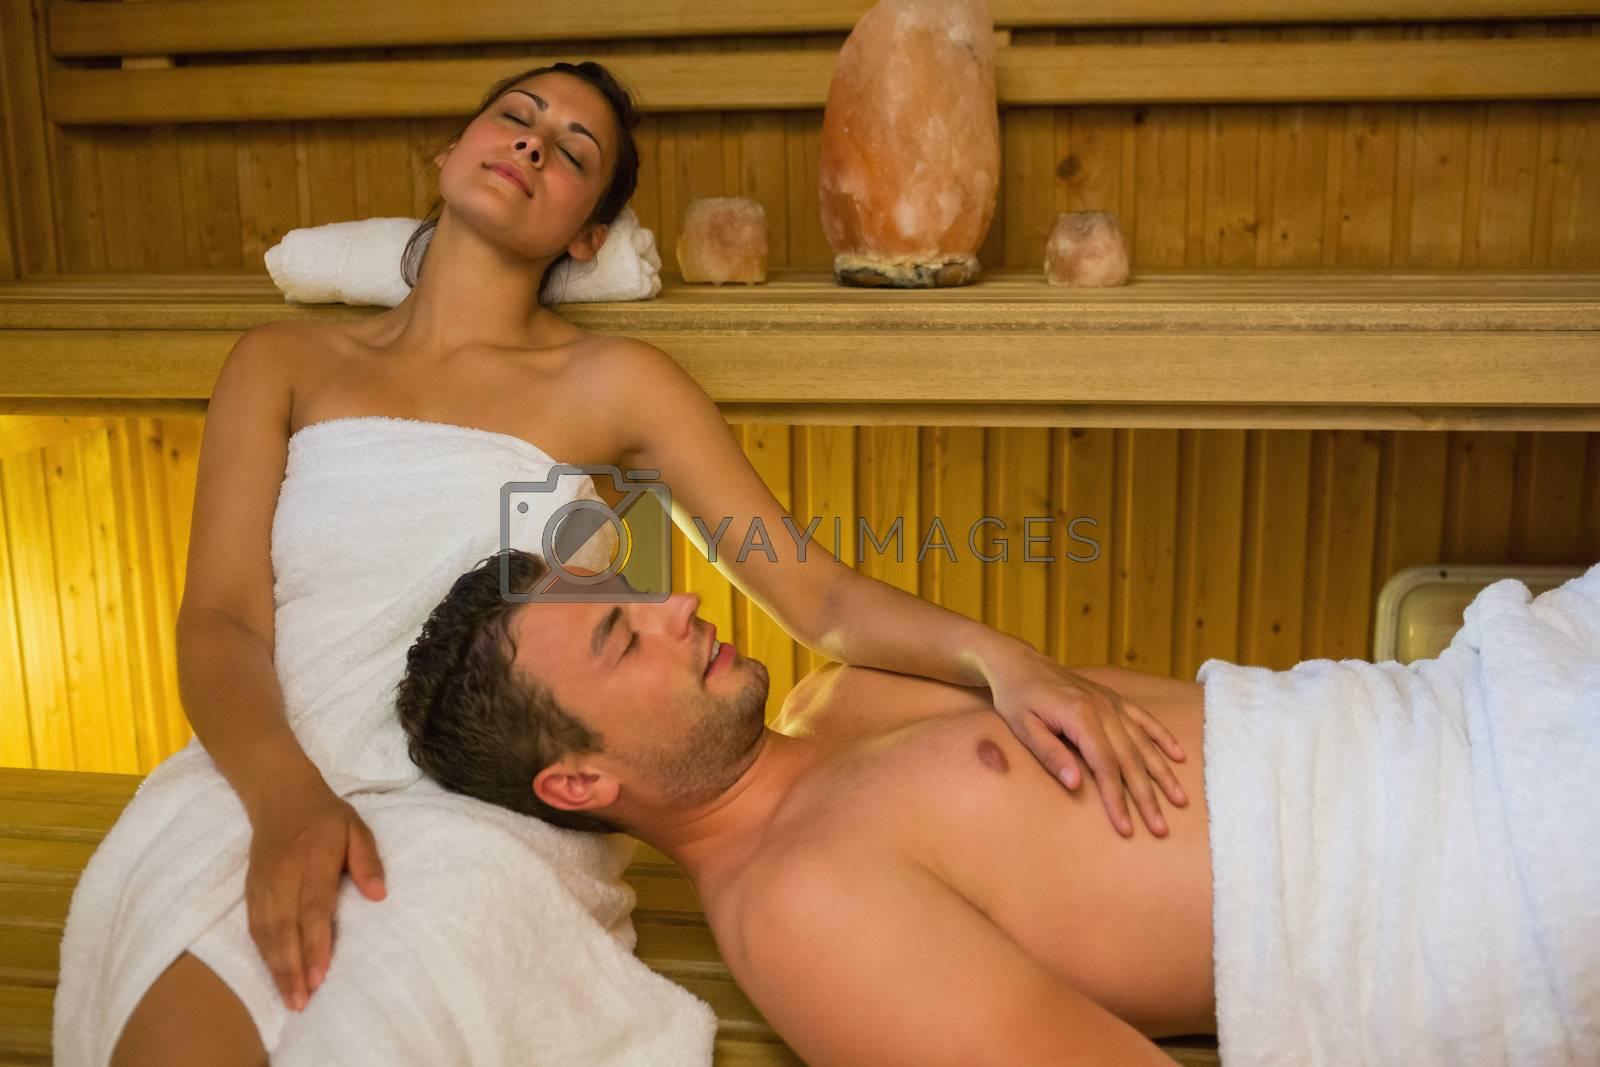 Loving couple relaxing in a sauna by Wavebreakmedia